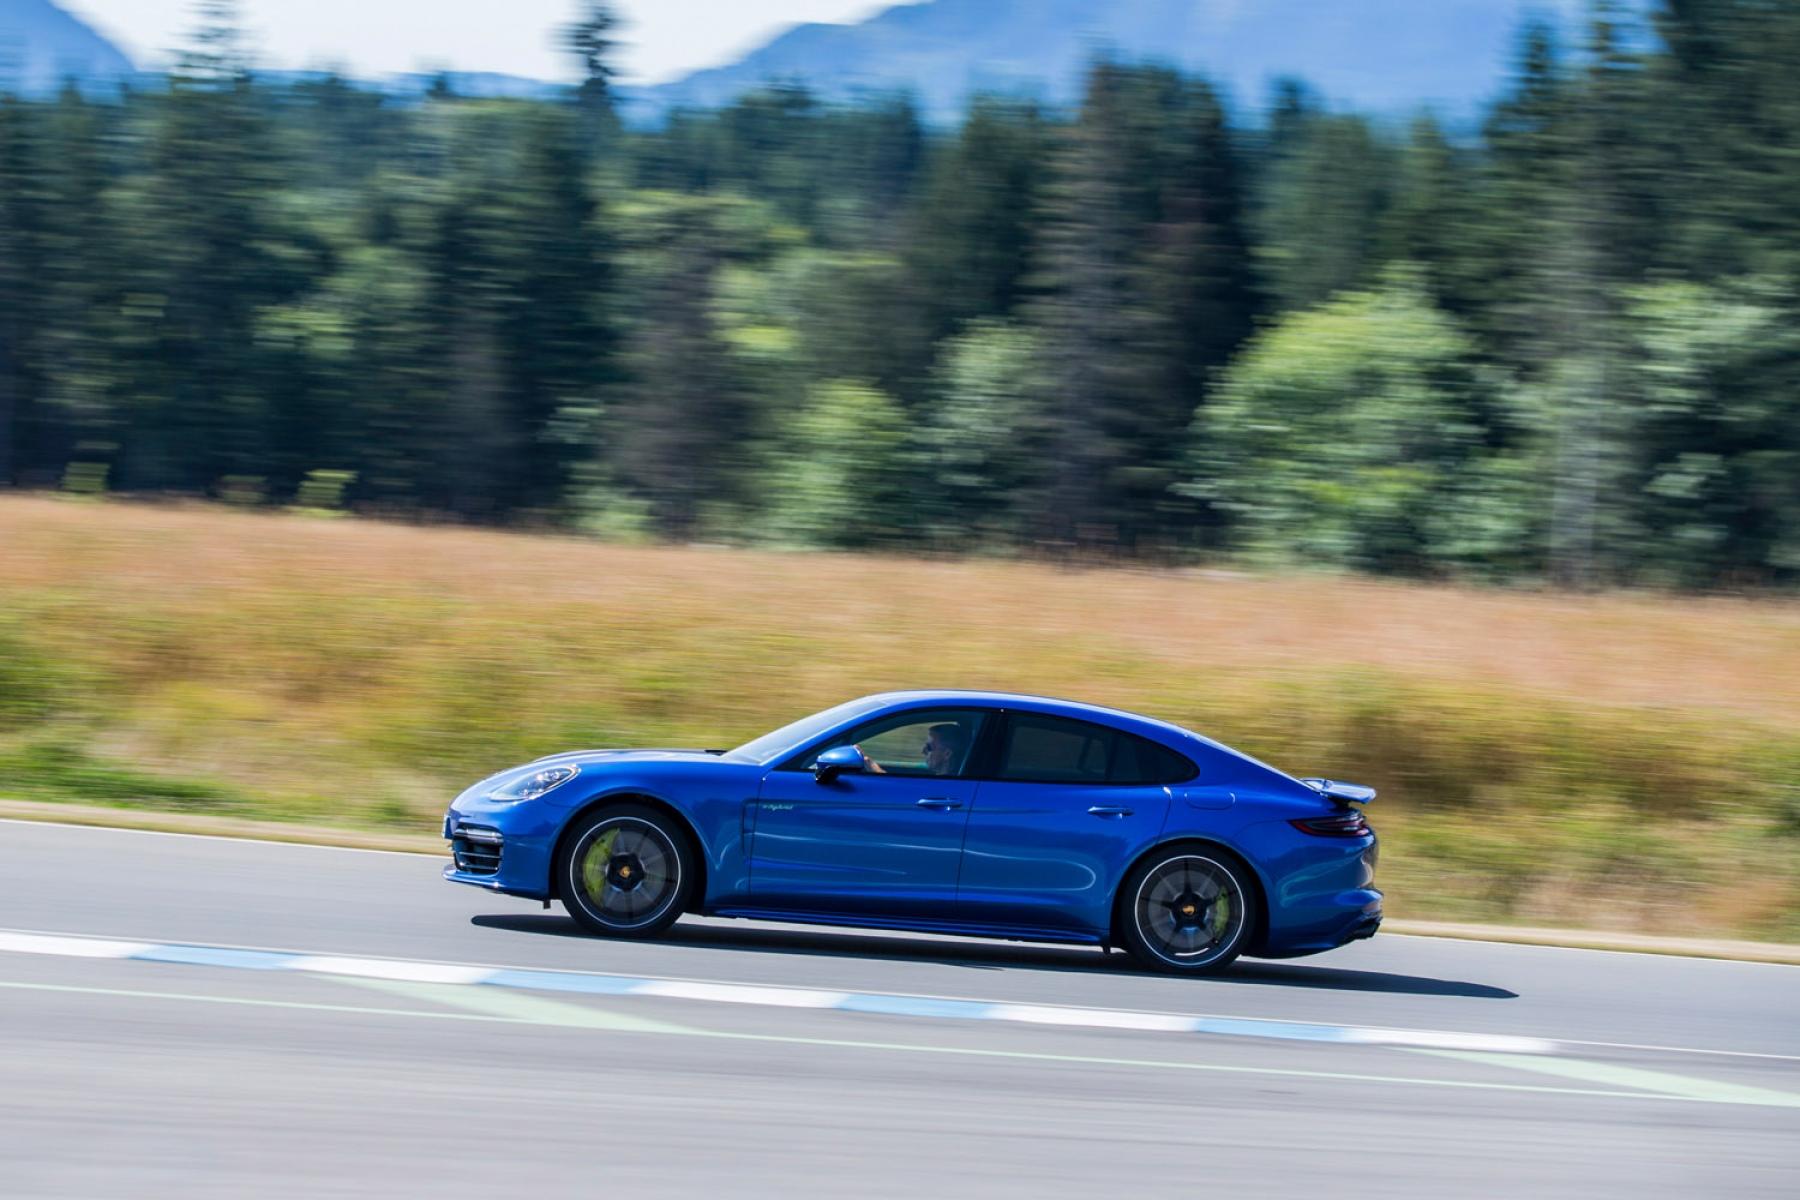 Photos Panamera Turbo S E Hybrid Sapphire Blue Metallic